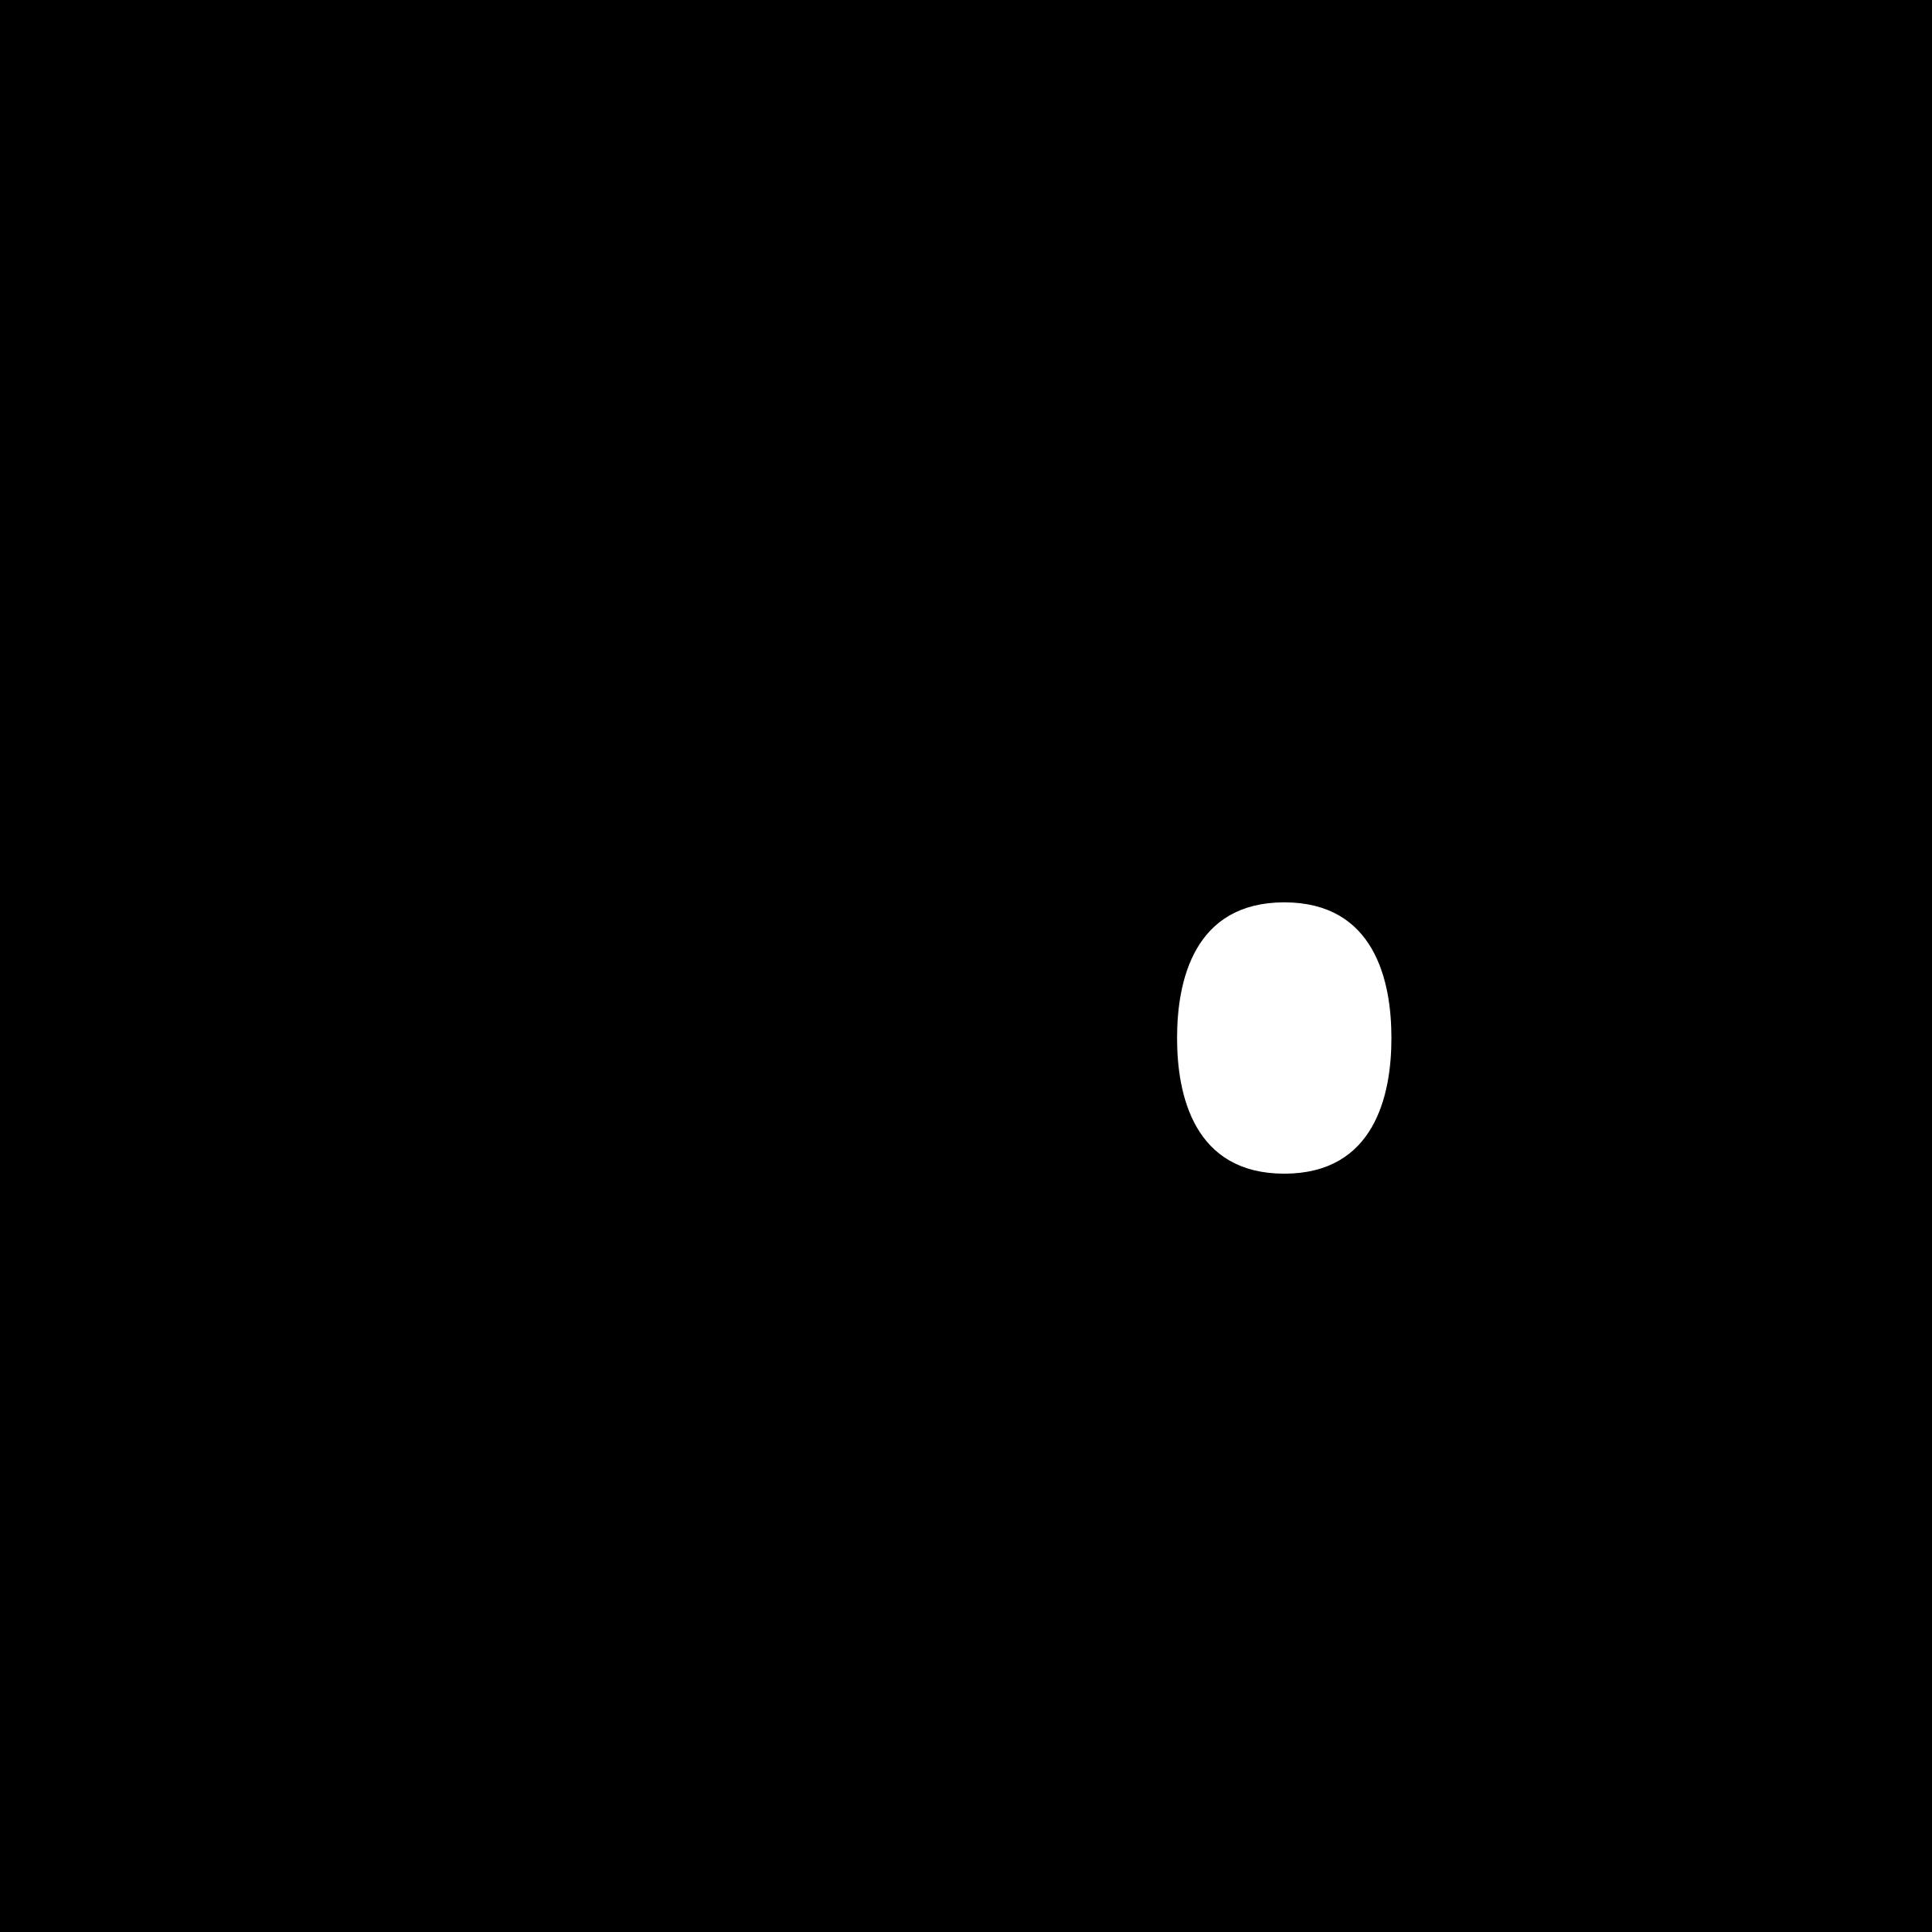 knoll-logo-png-transparent.png